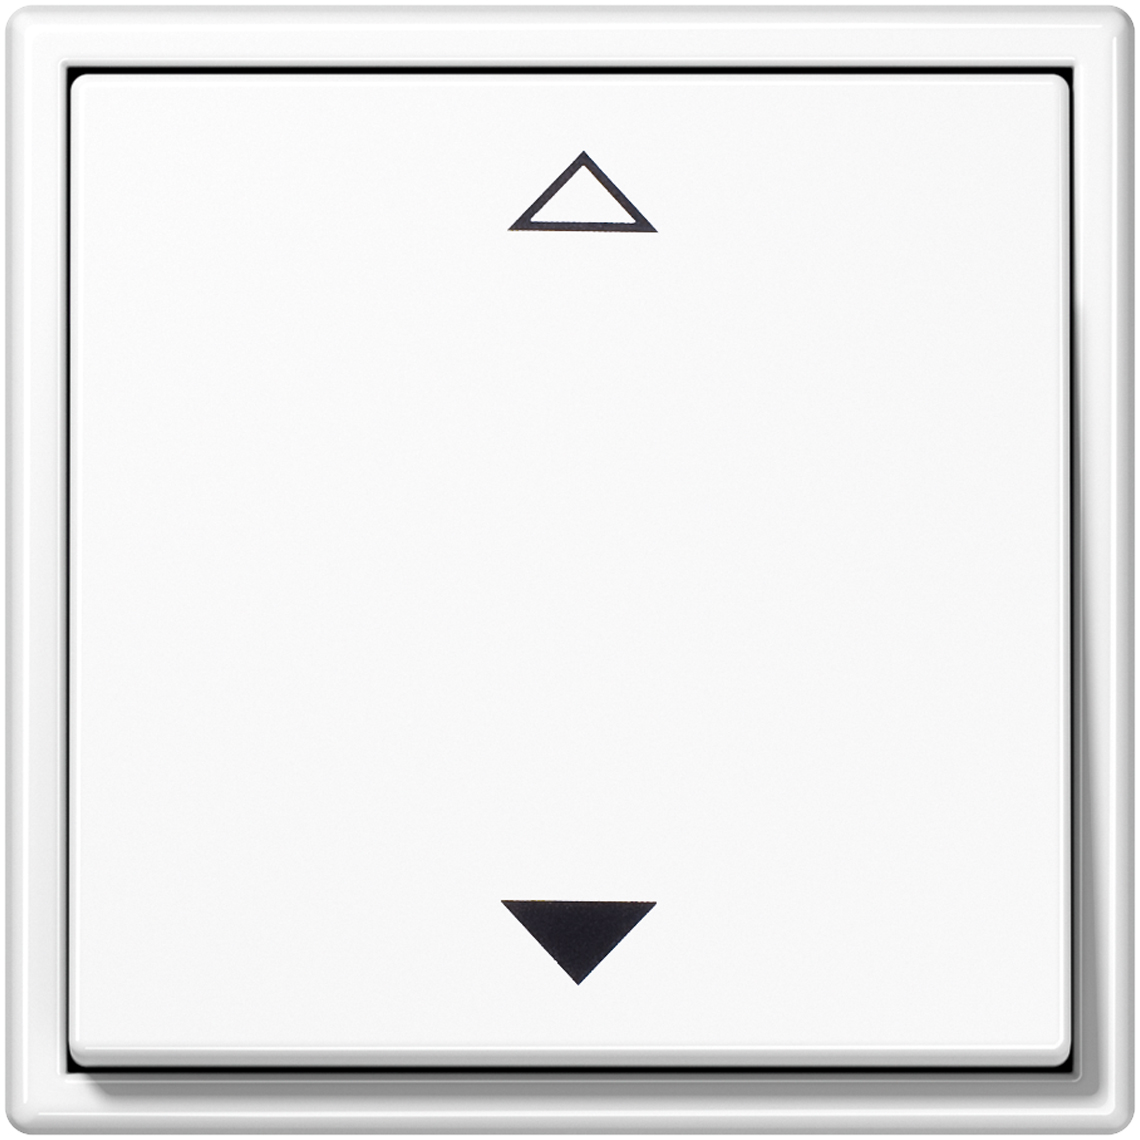 2-Kanal Jalousie Jung LS 990 alpinweiß Produktbild